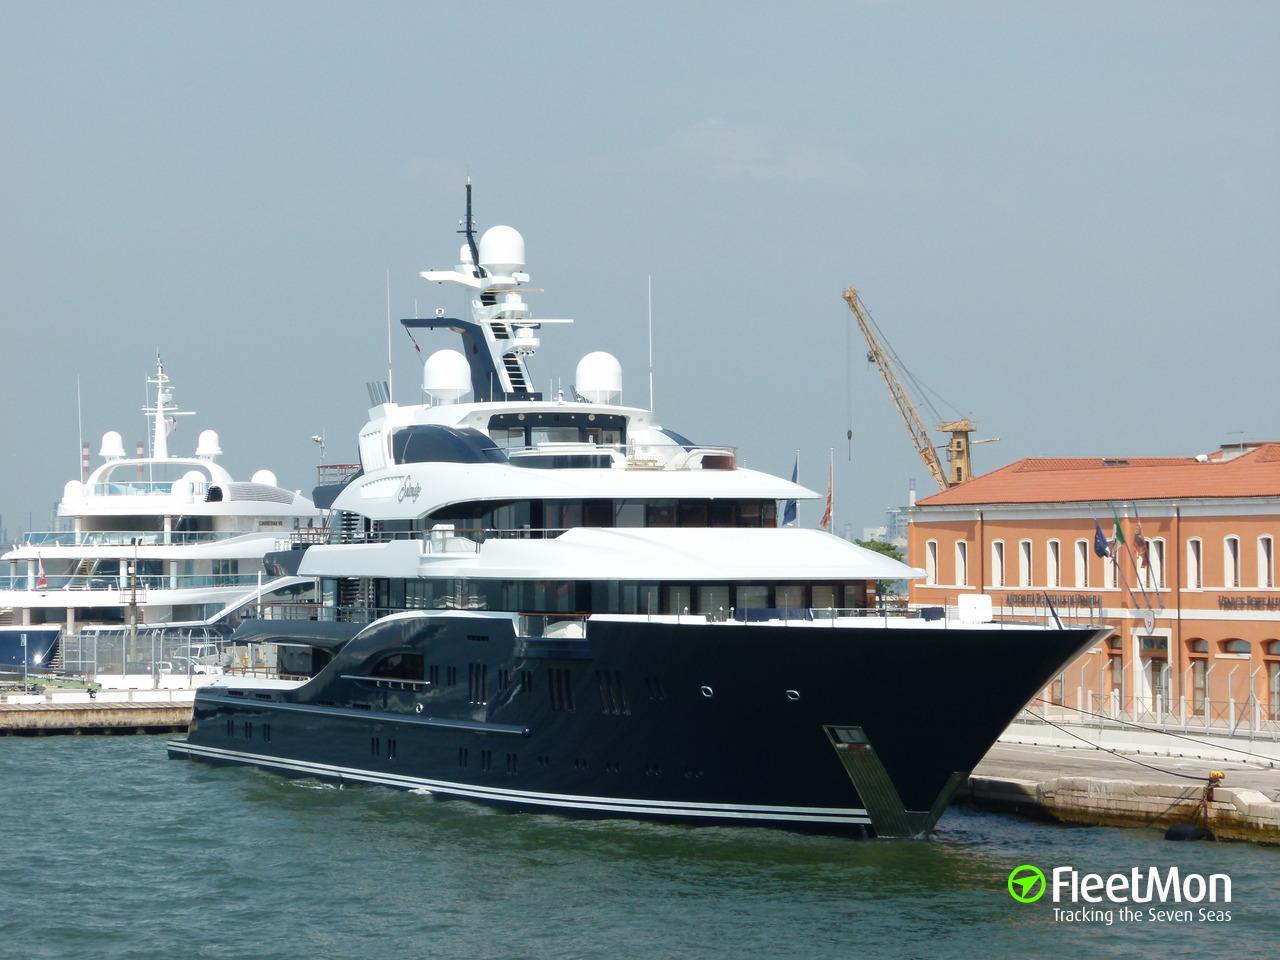 Vessel Solandge Yacht Imo 1011575 Mmsi 248287000